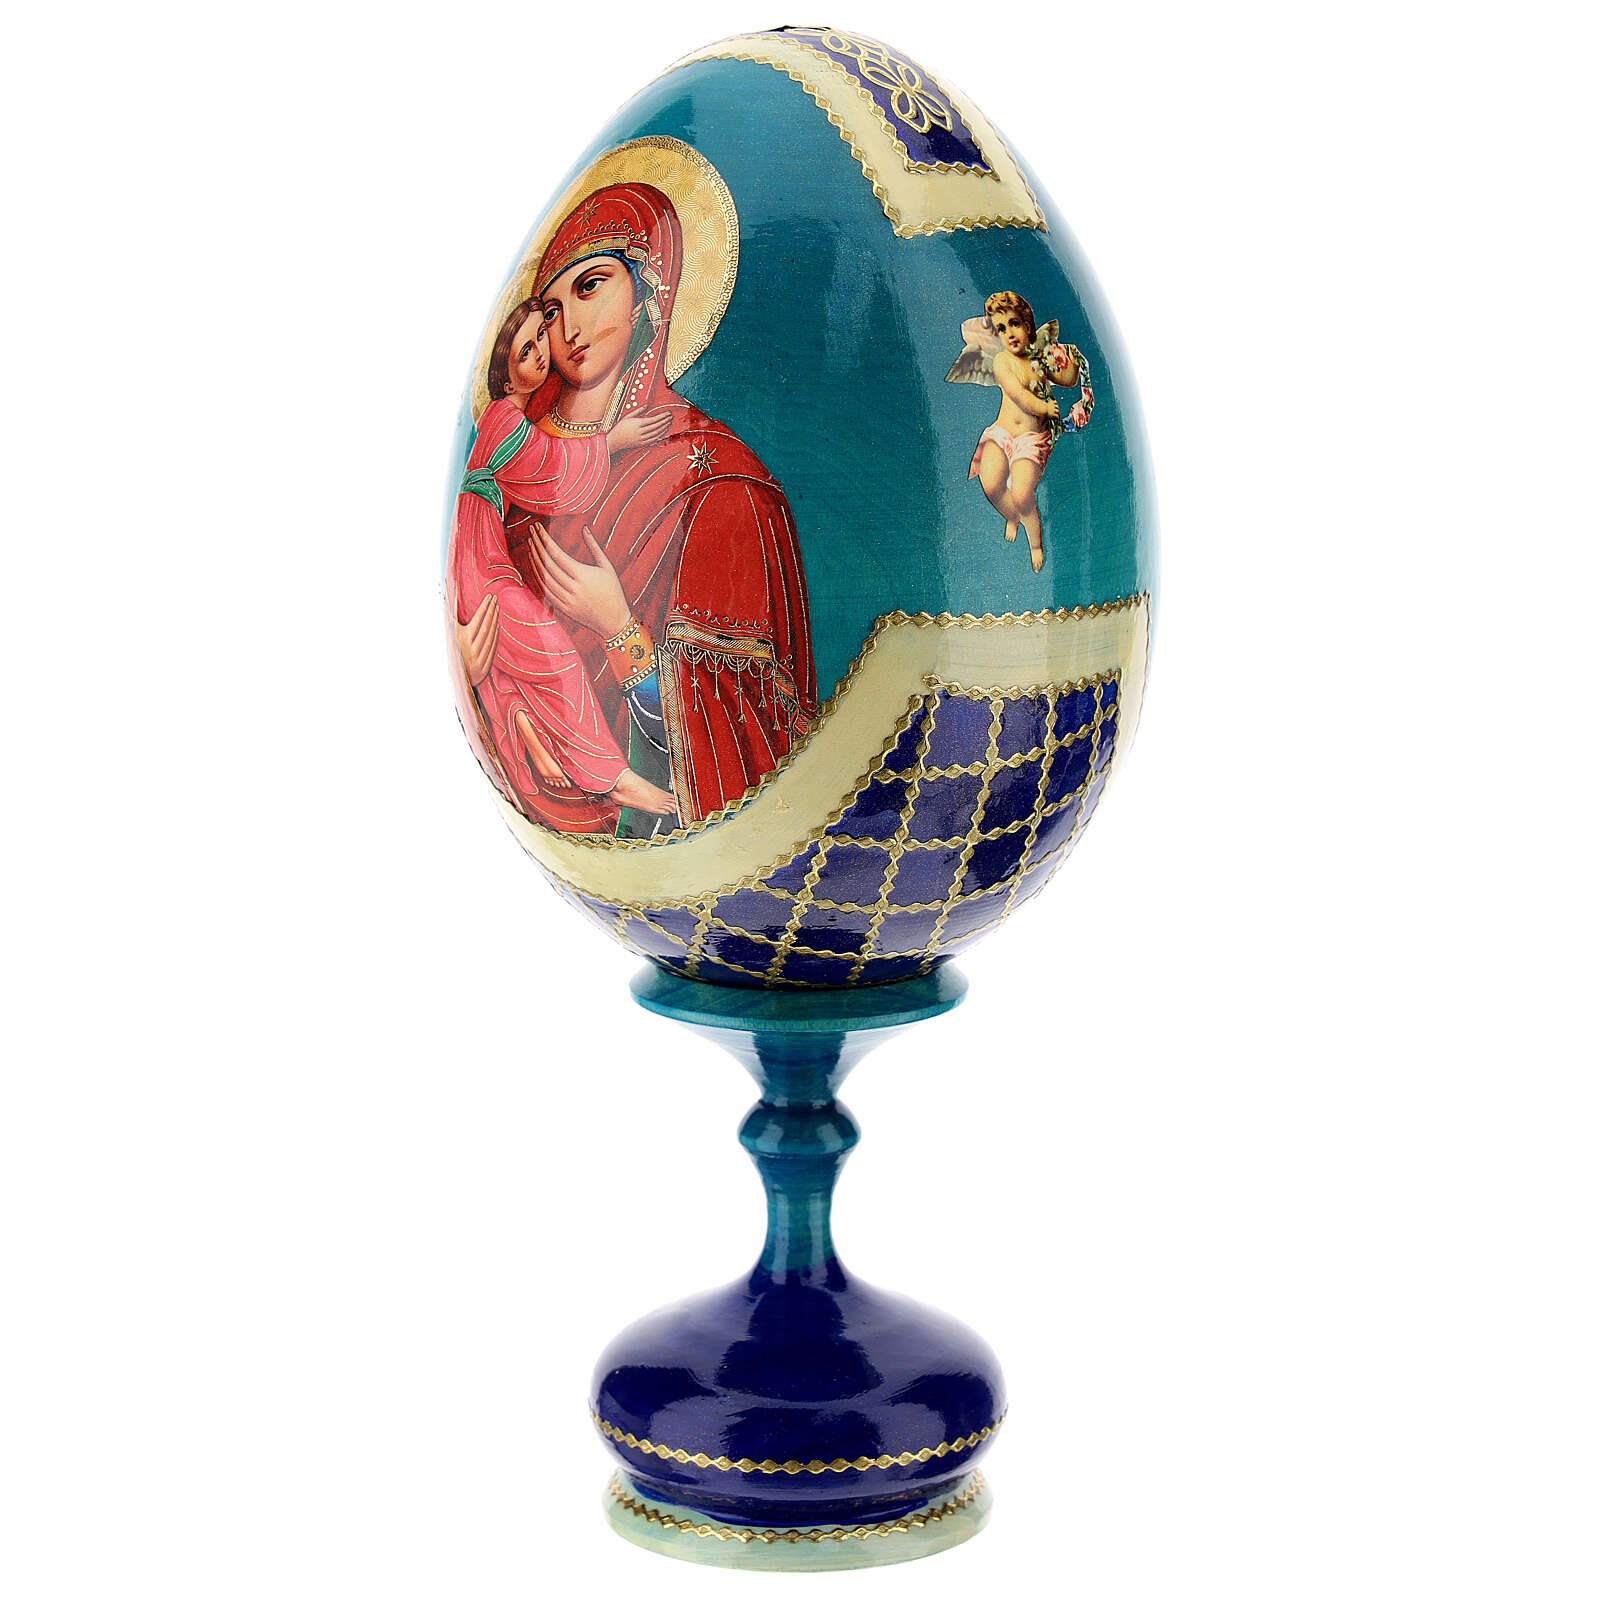 Russian Egg Theotokos of Vladimir découpage, Fabergè style 20cm 4